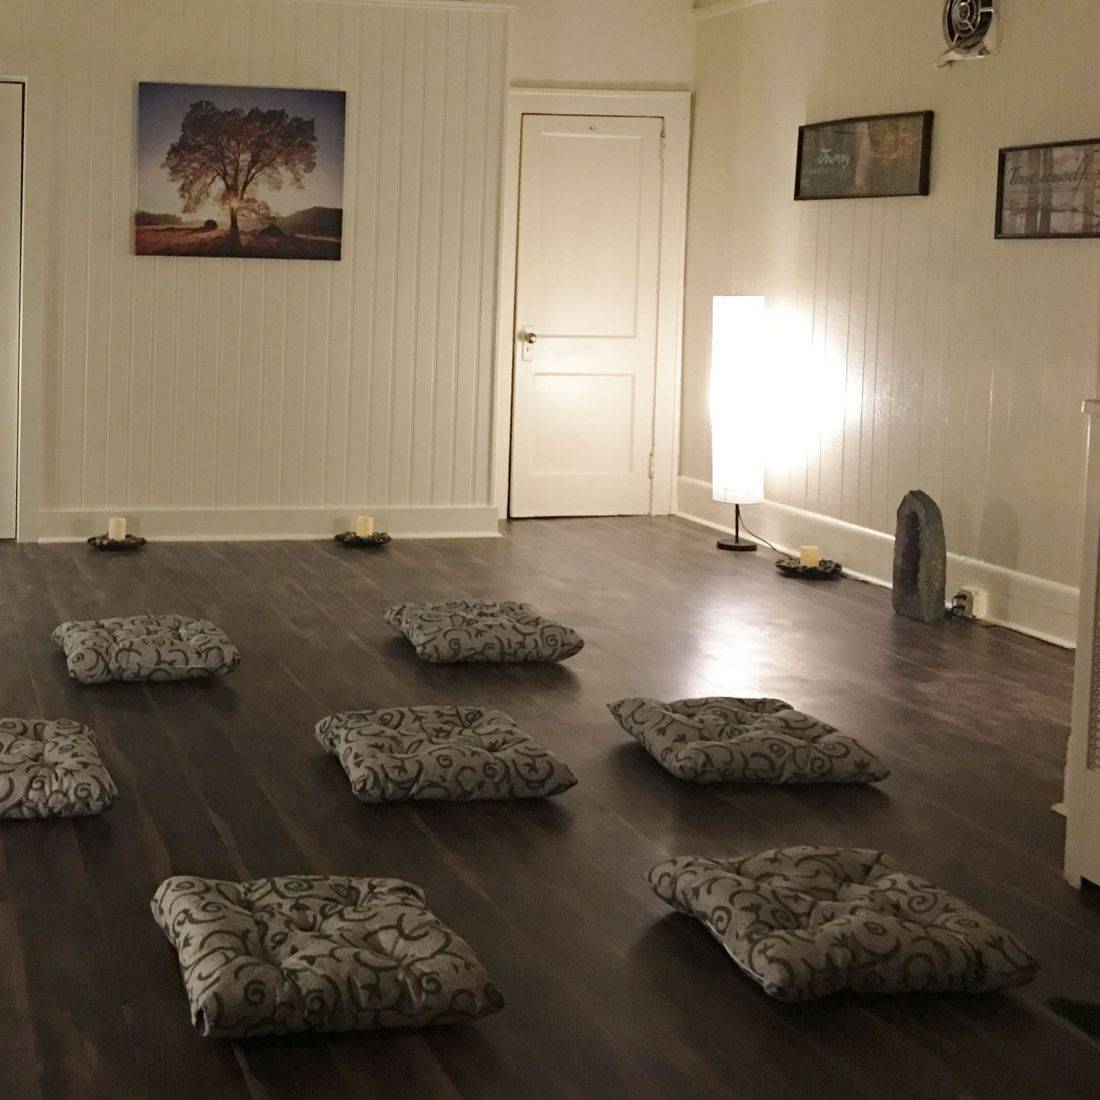 earth's healings, meditation, group meditation,  metaphysical shop, new age shop, smudges, incense, crystals, river edge nj